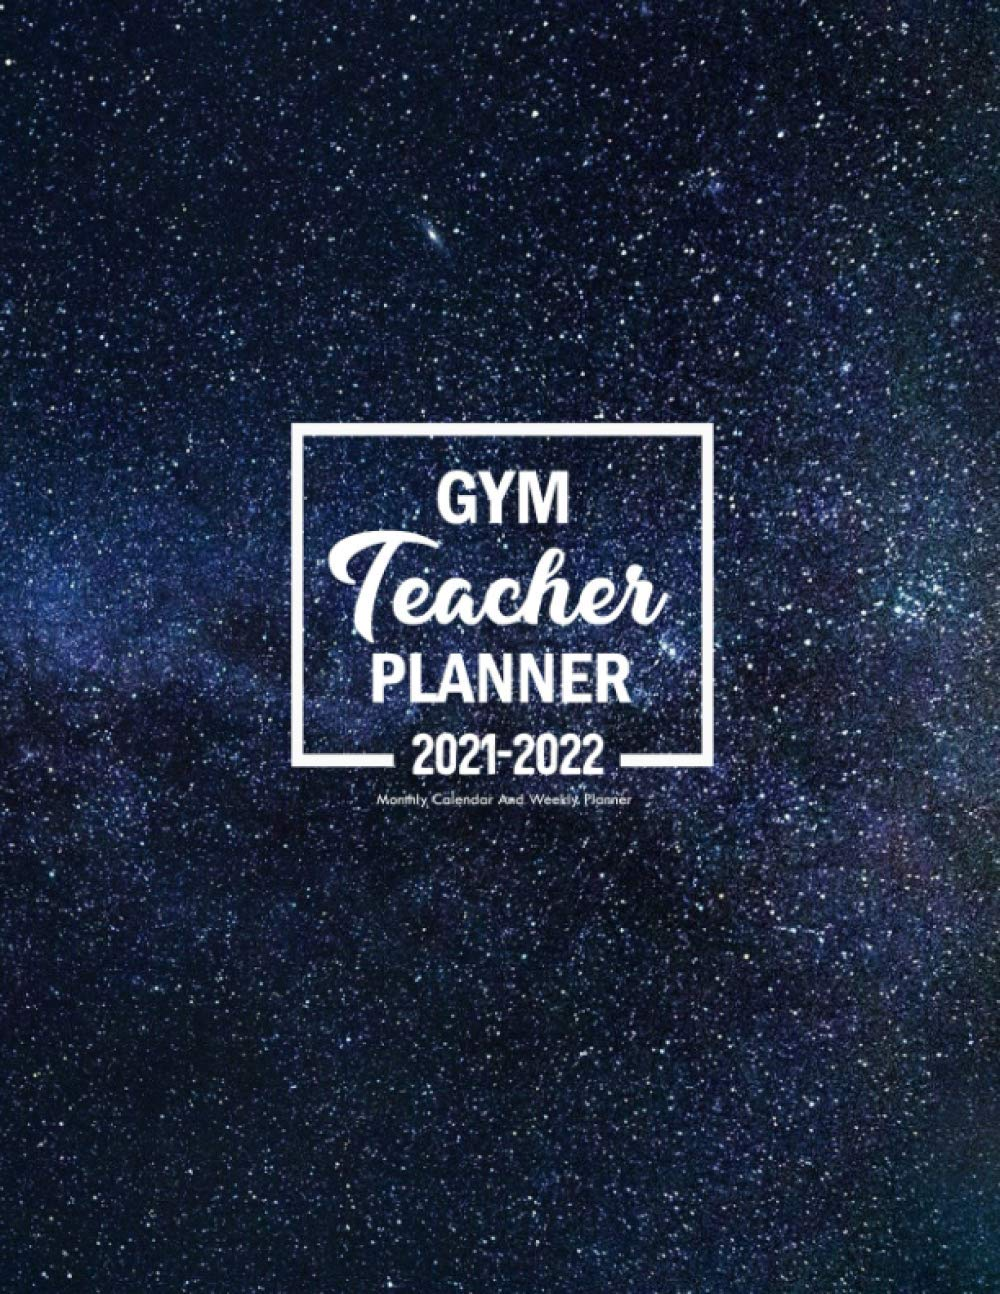 Head Start Calendar 2021-2022 Gym Teacher Planner 2021 2022: Pretty Simple Planners Weekly and